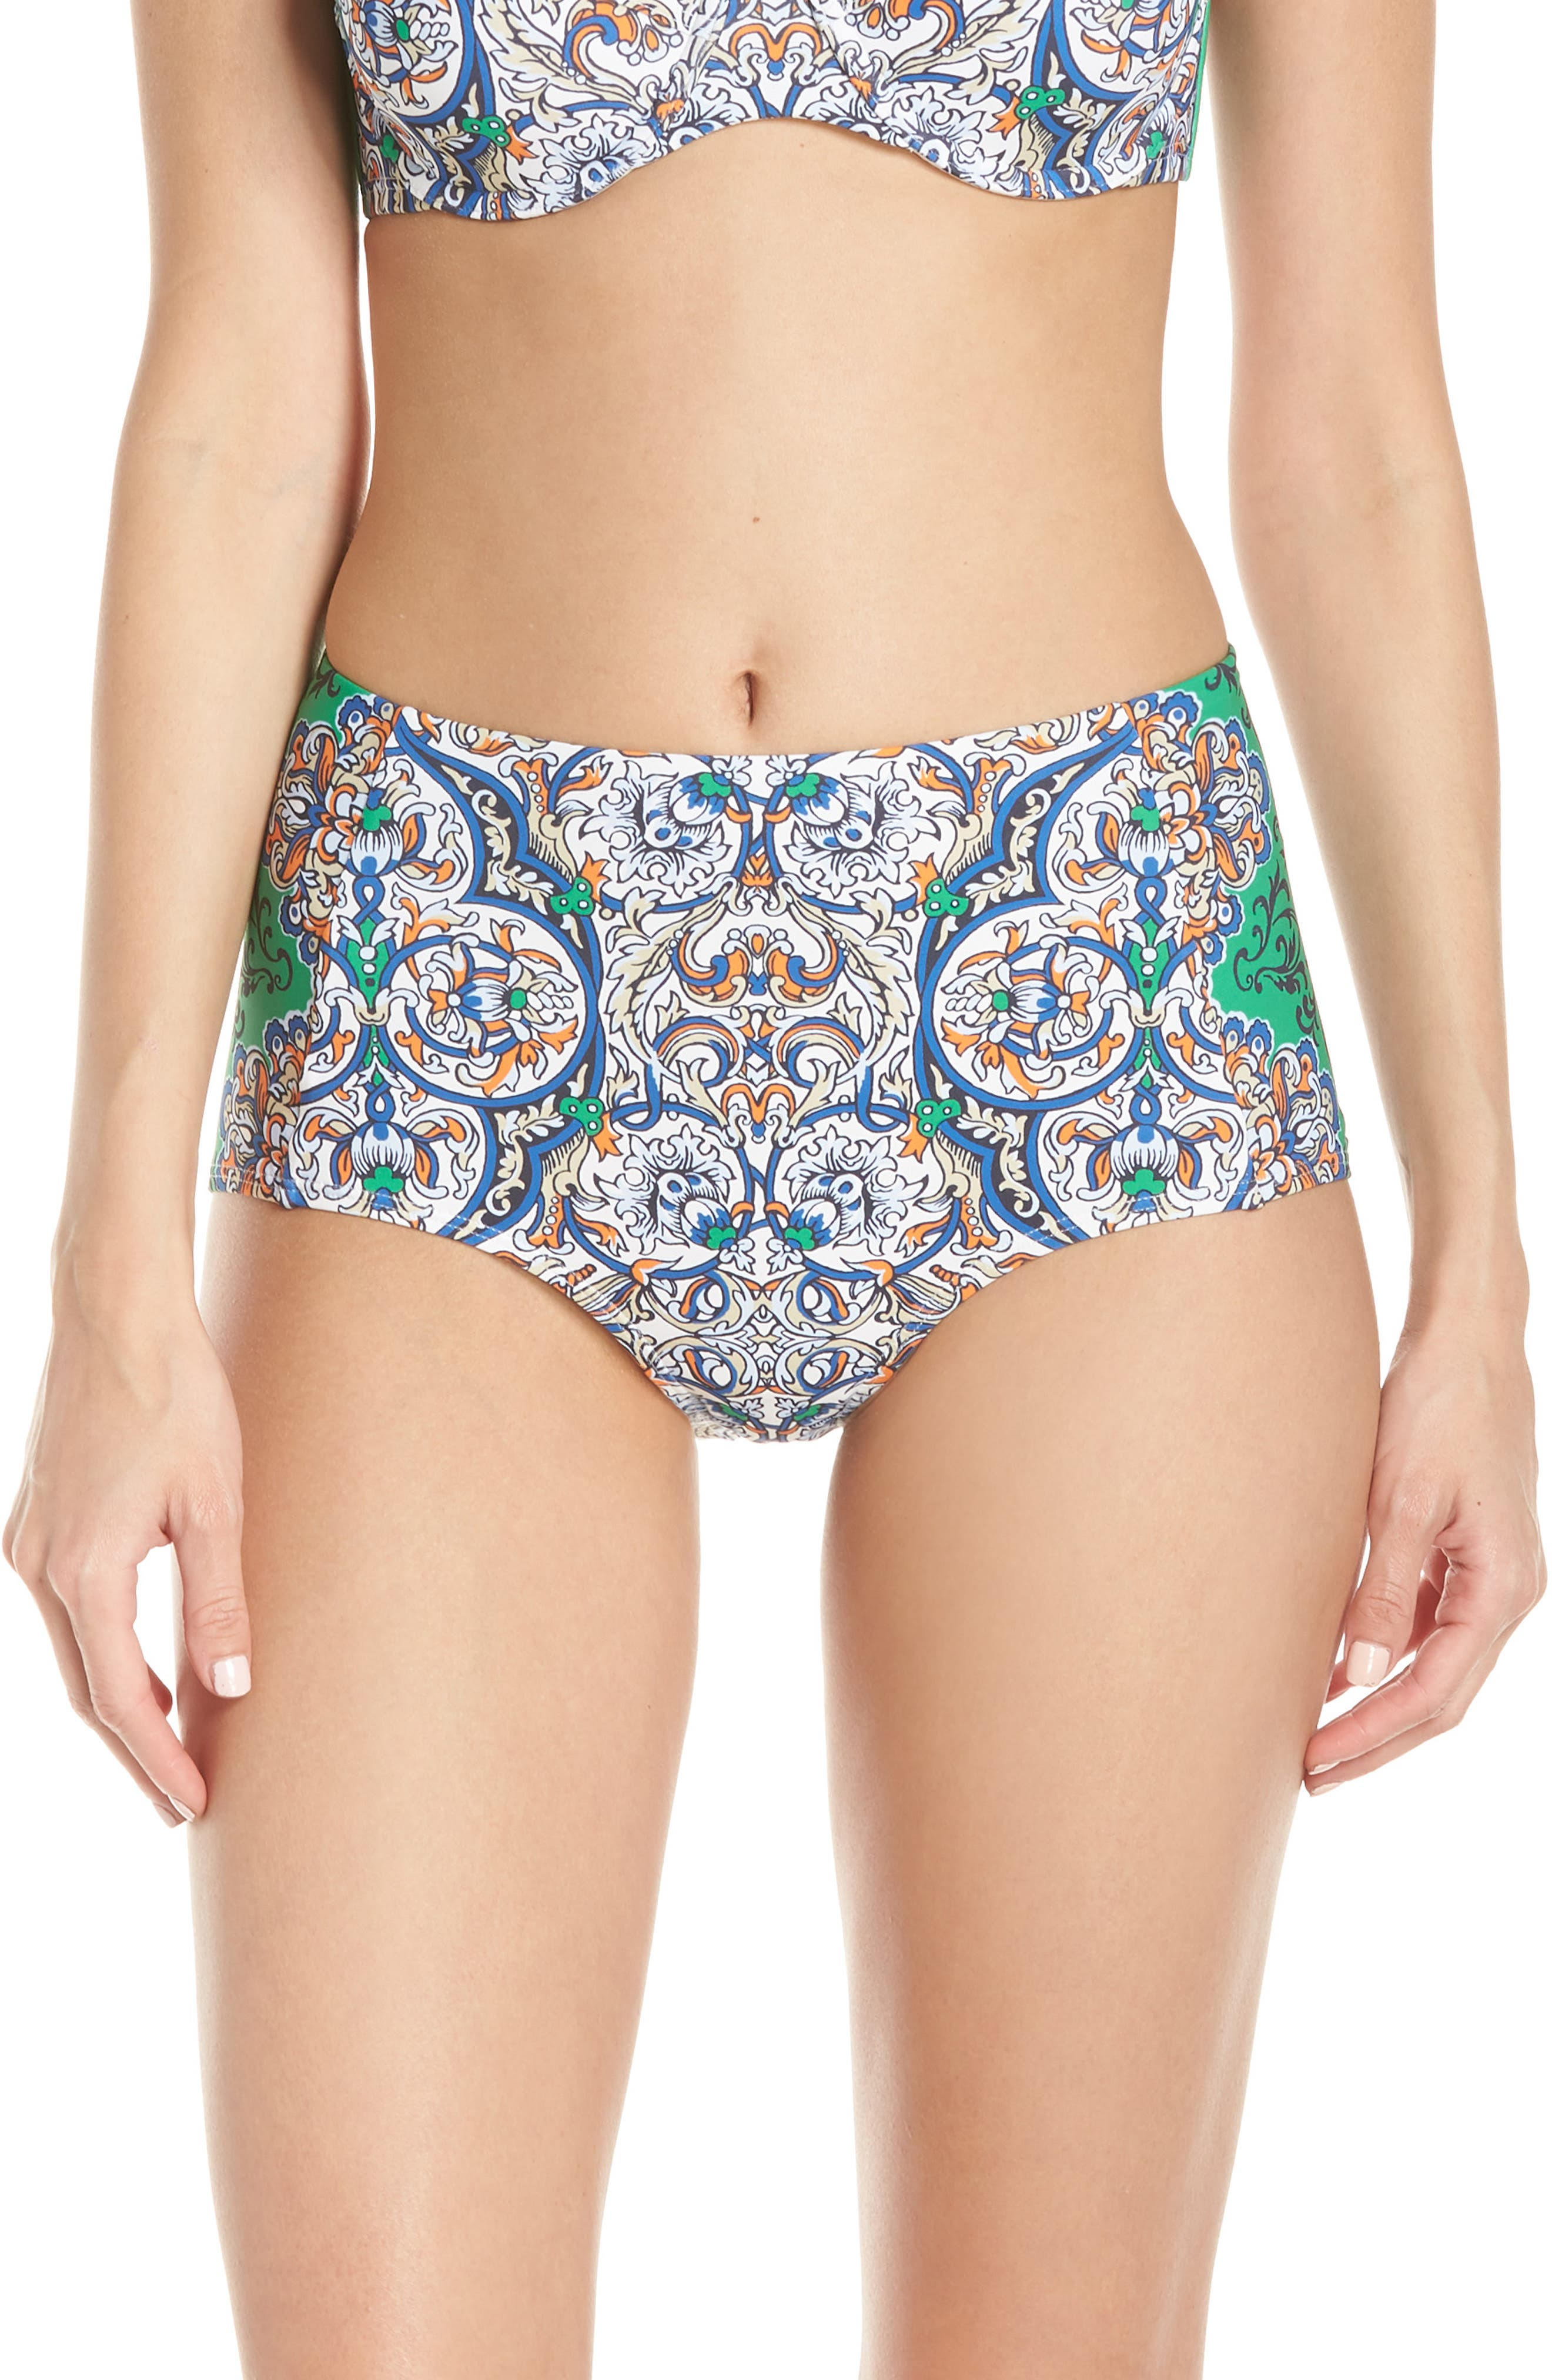 Tory Burch High Waist Bikini Bottoms, Blue